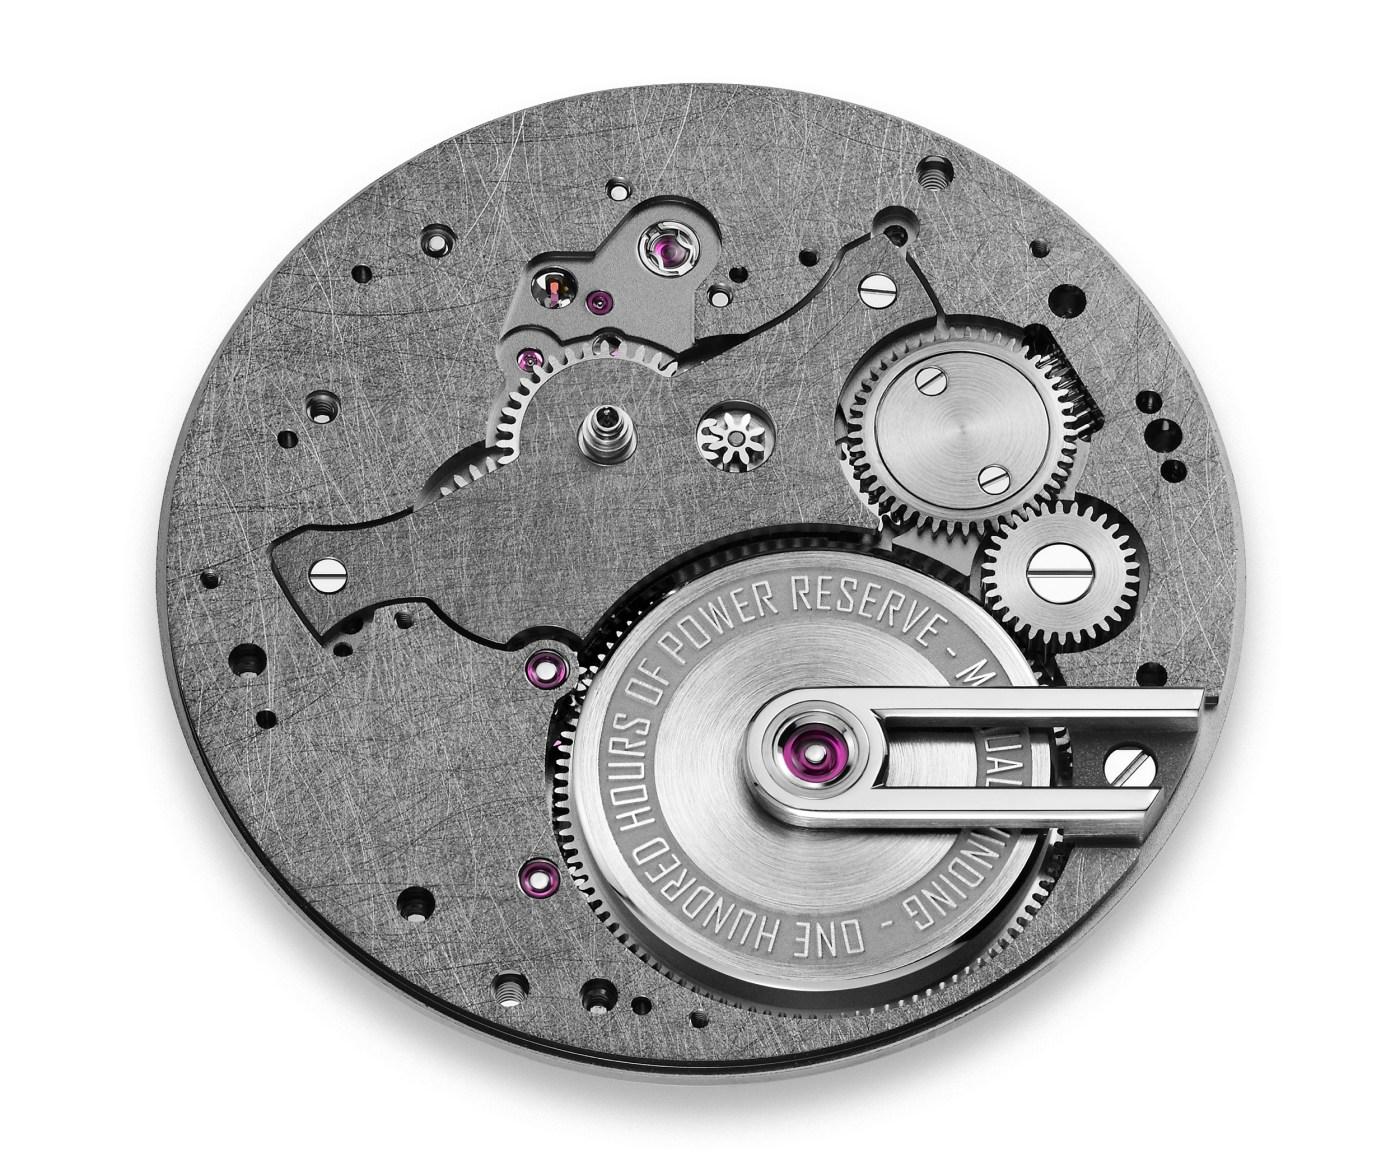 Armin Strom caliber AMW21 dial side